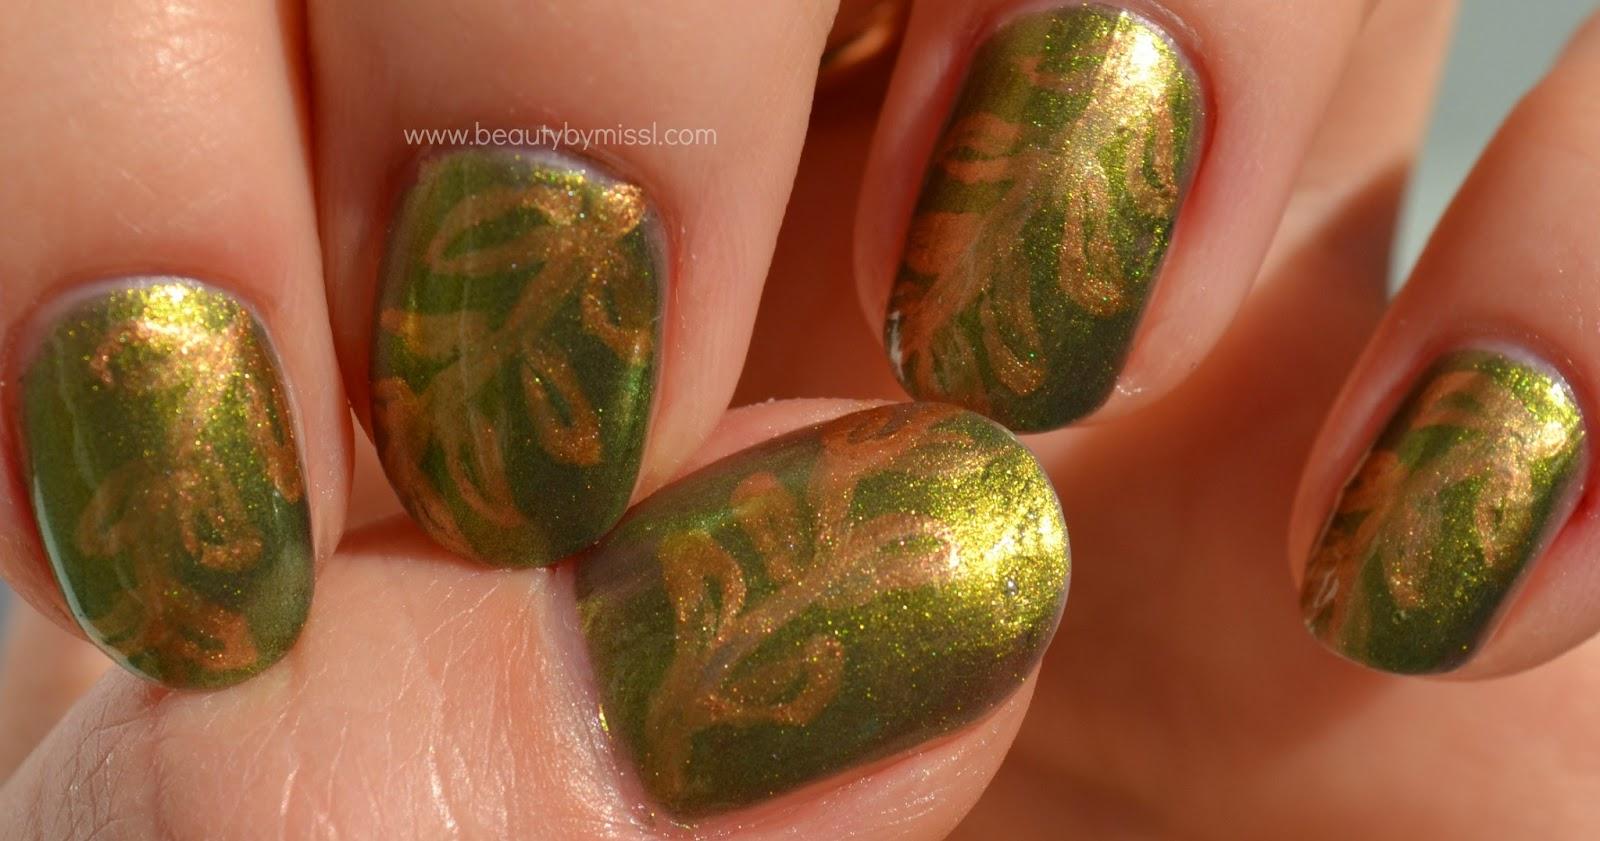 notd manicure